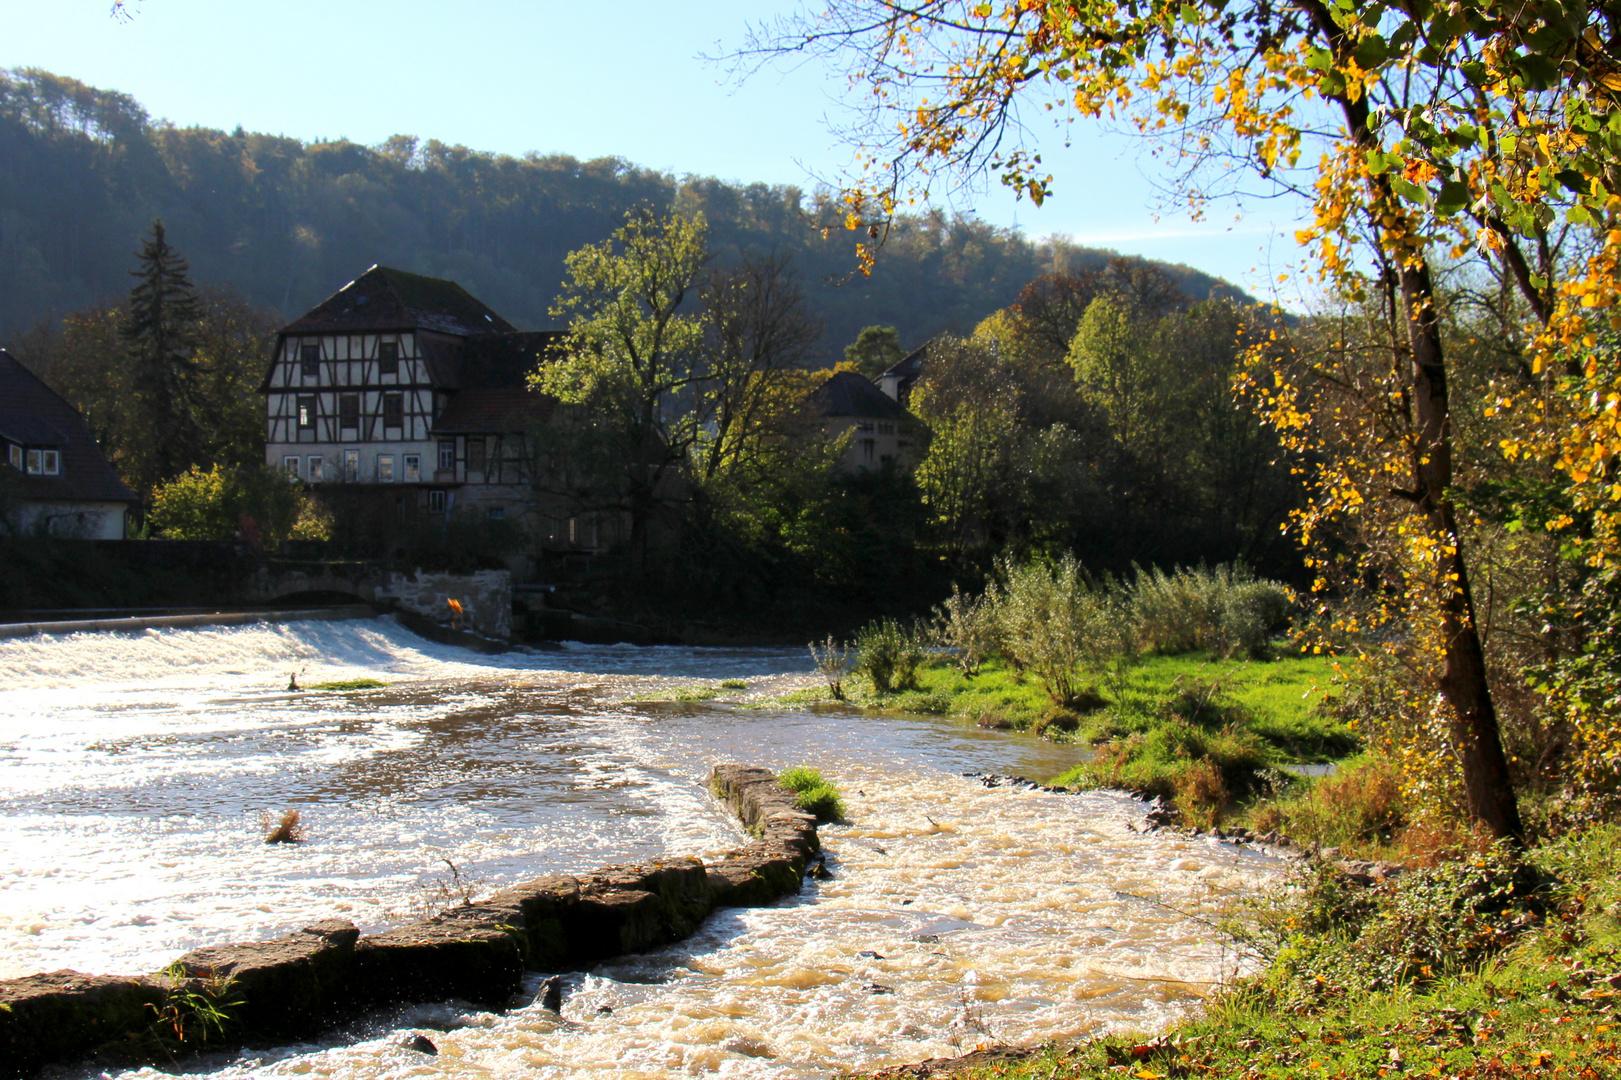 Blick auf dei alte Mühle